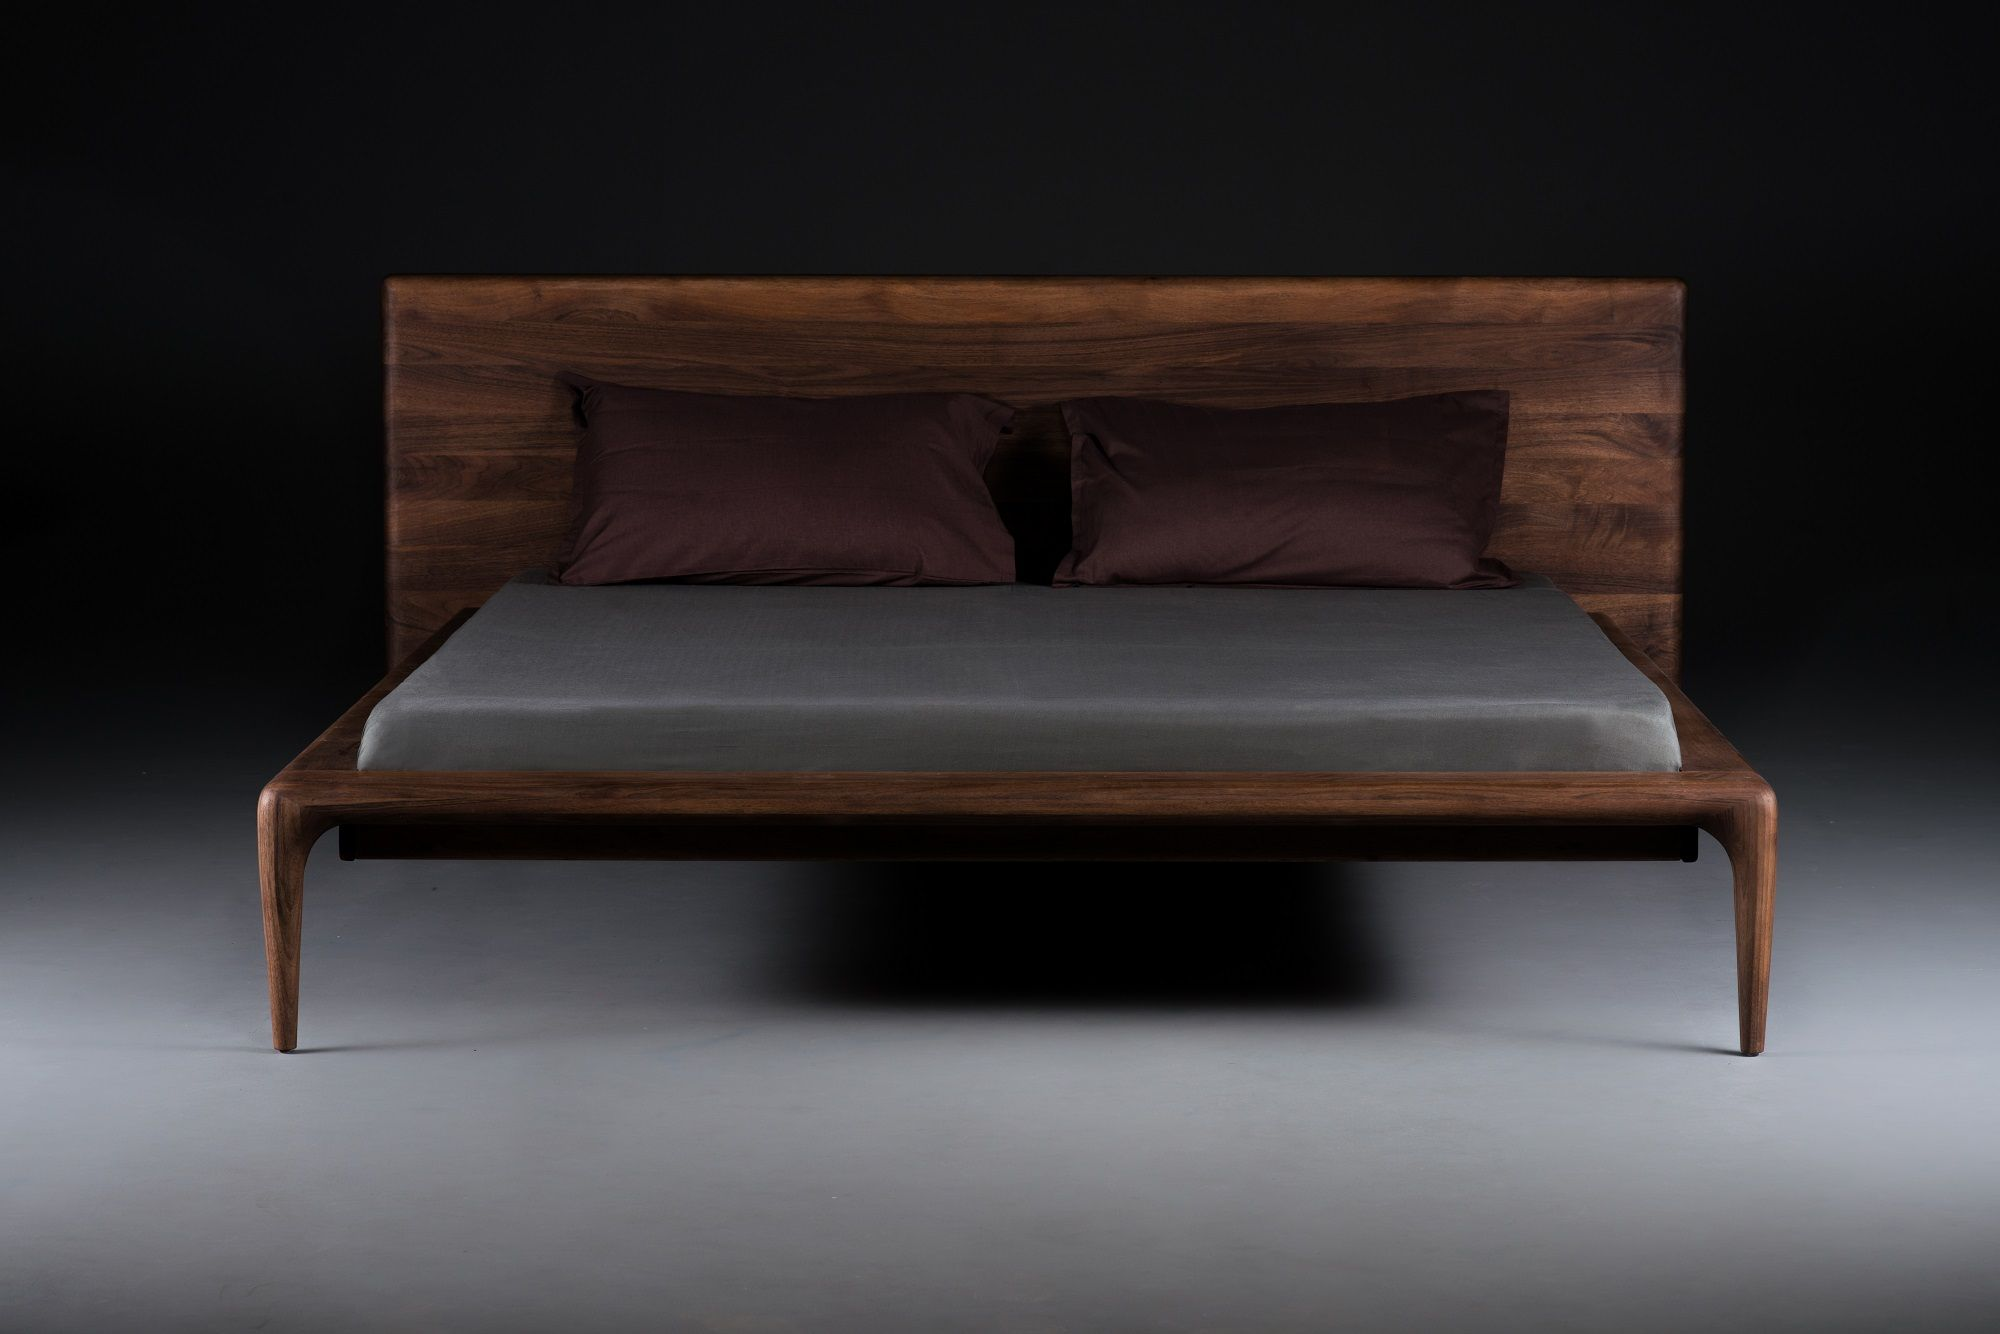 Massiv Holz Bett mit hoher Lehne Bett ideen